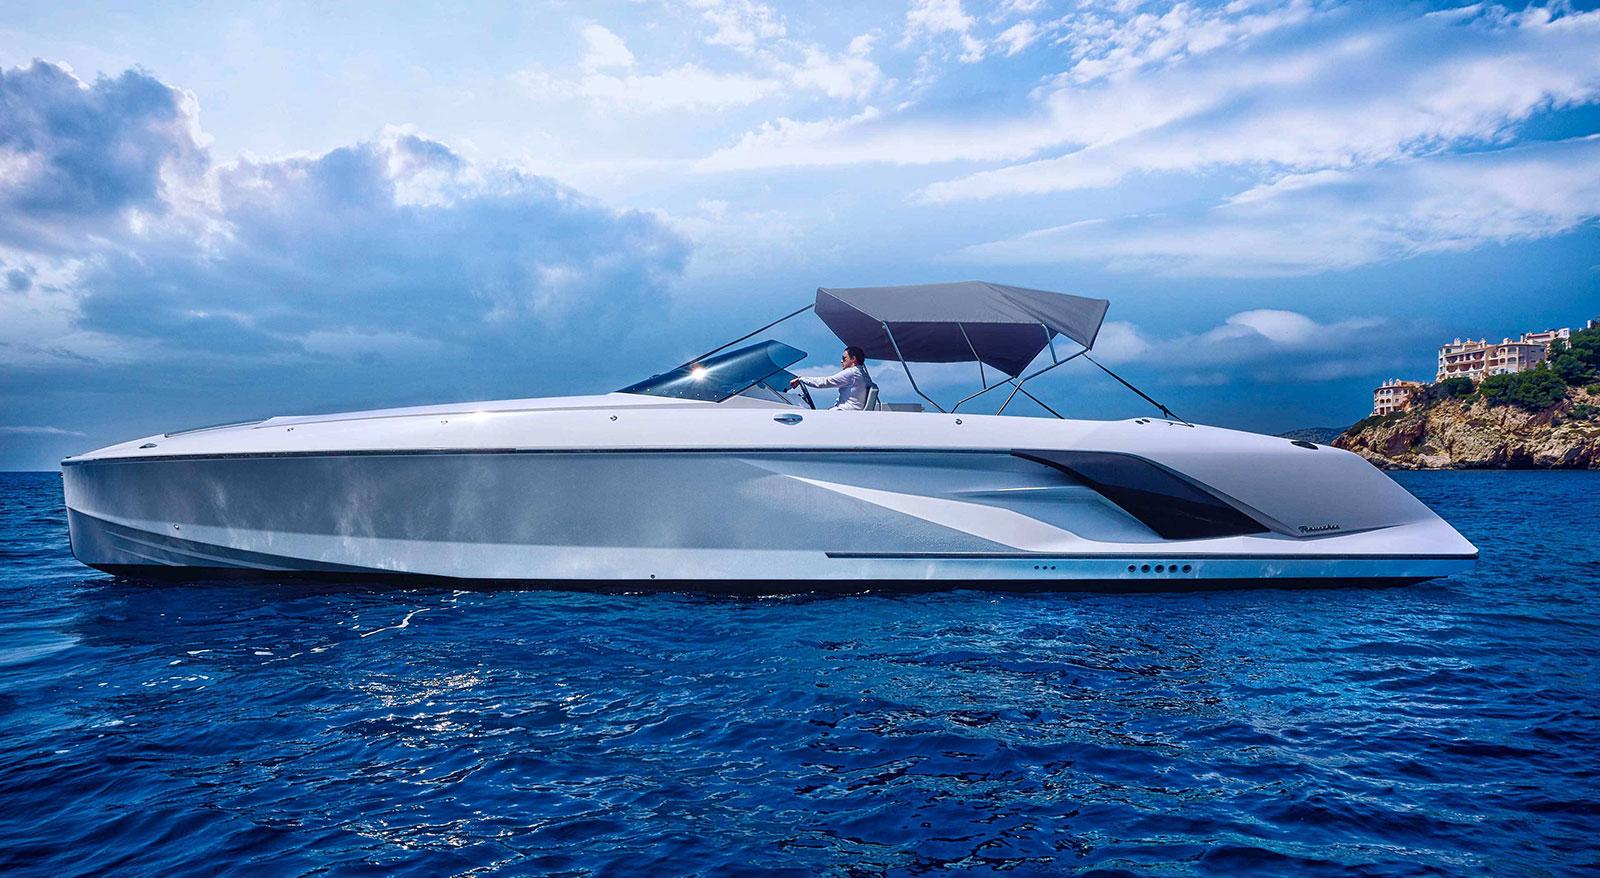 Motorboot-Charter-Mallorca-Motoryacht-Charter-Mallorca-6